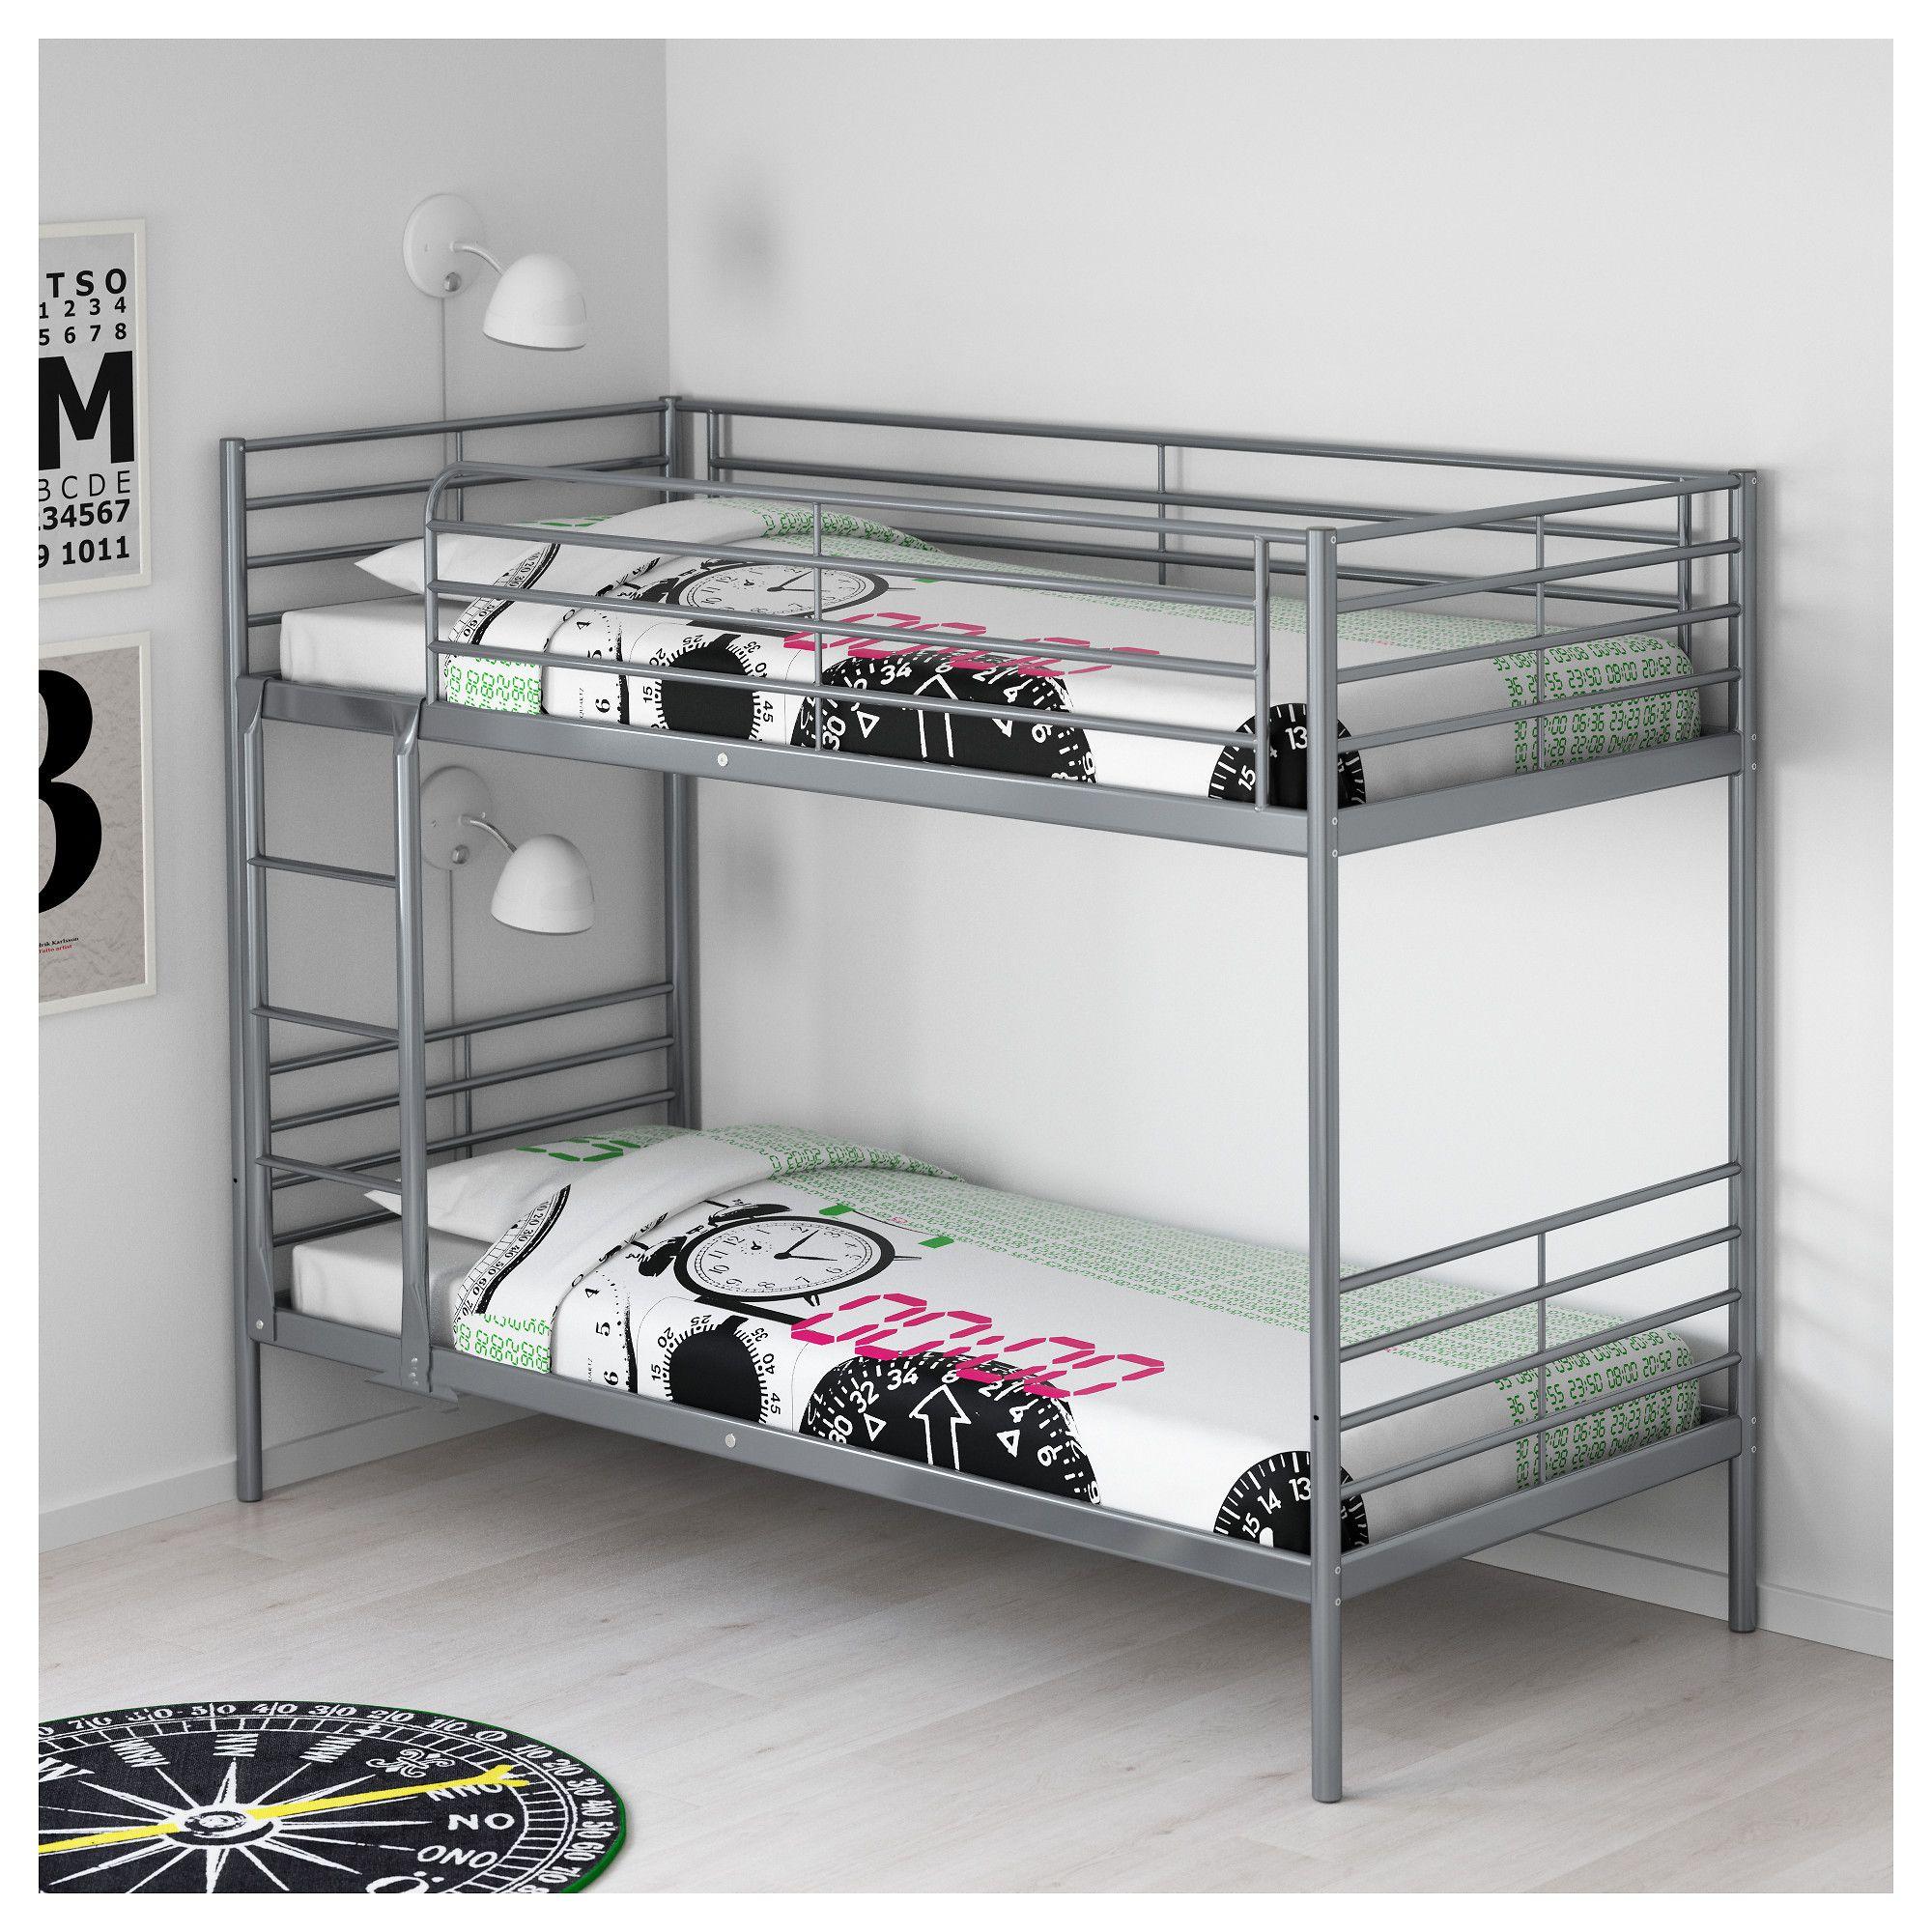 Loft bed ideas for low ceiling  IKEA  SVÄRTA Bunk bed frame silver color  Tempat tidur  Pinterest